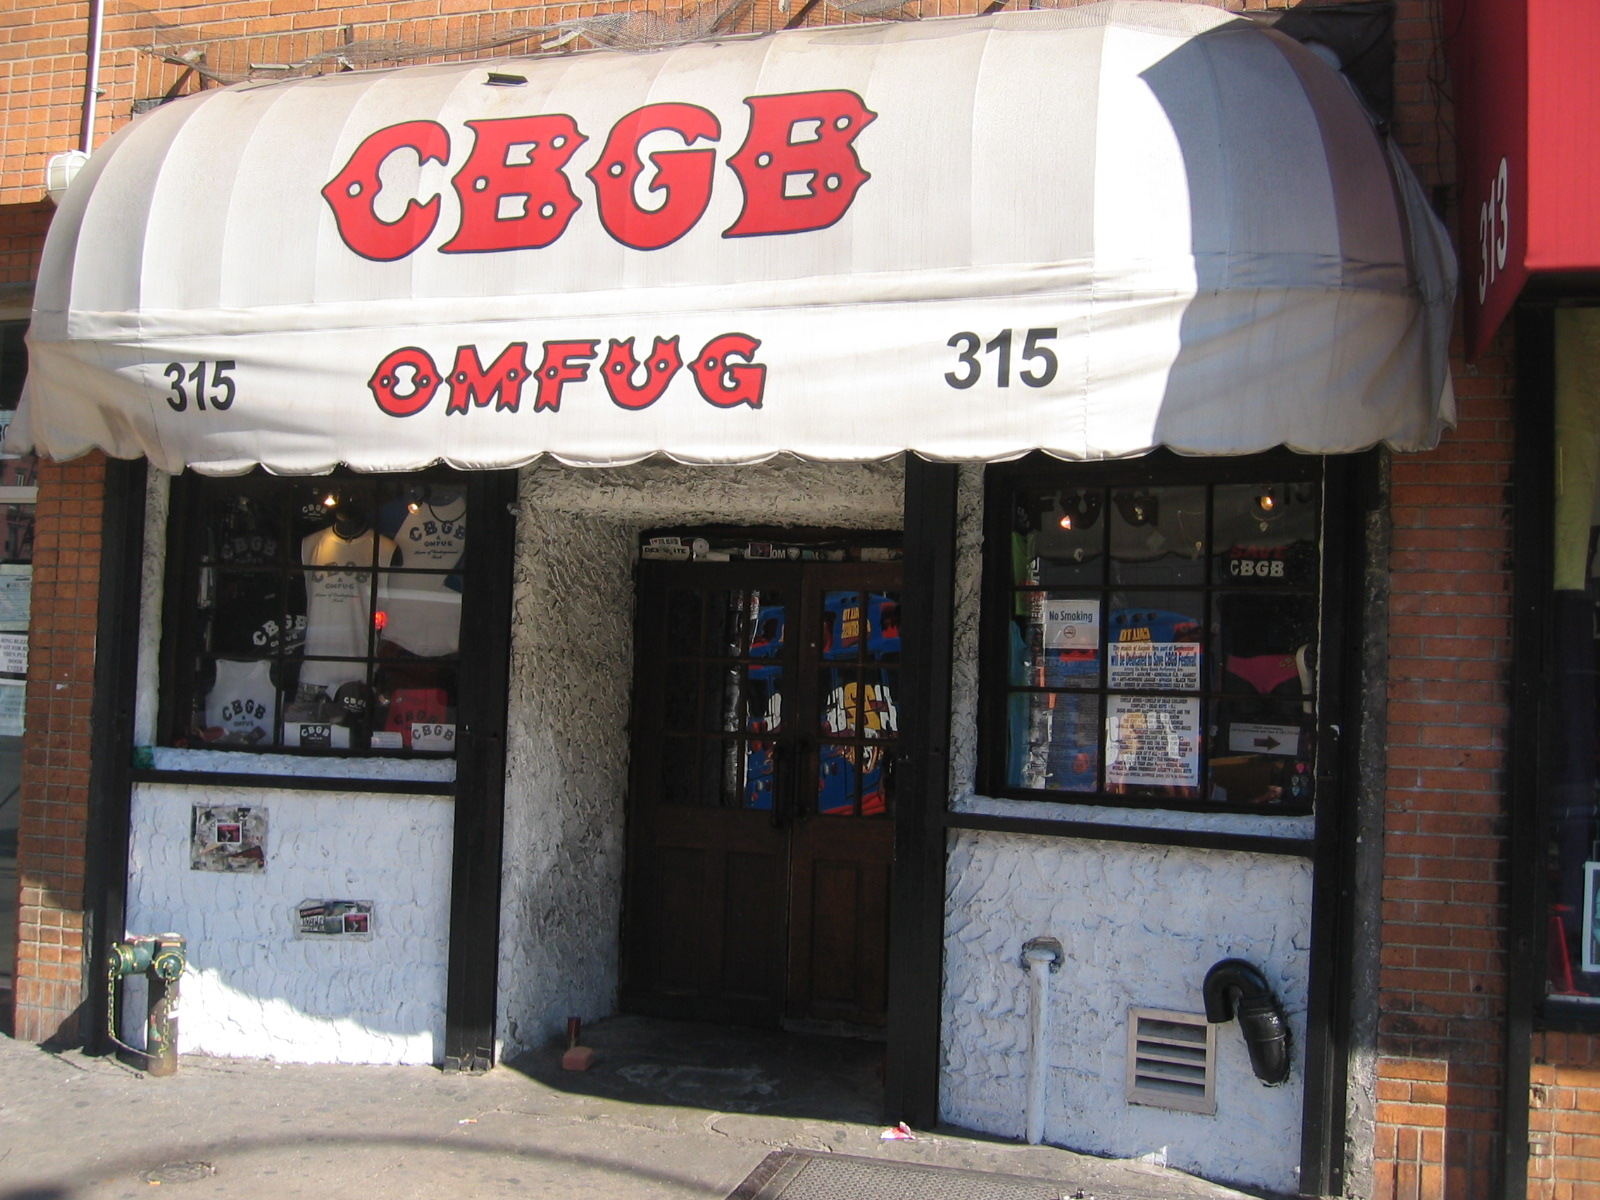 http://upload.wikimedia.org/wikipedia/commons/d/da/CBGB_club_facade.jpg